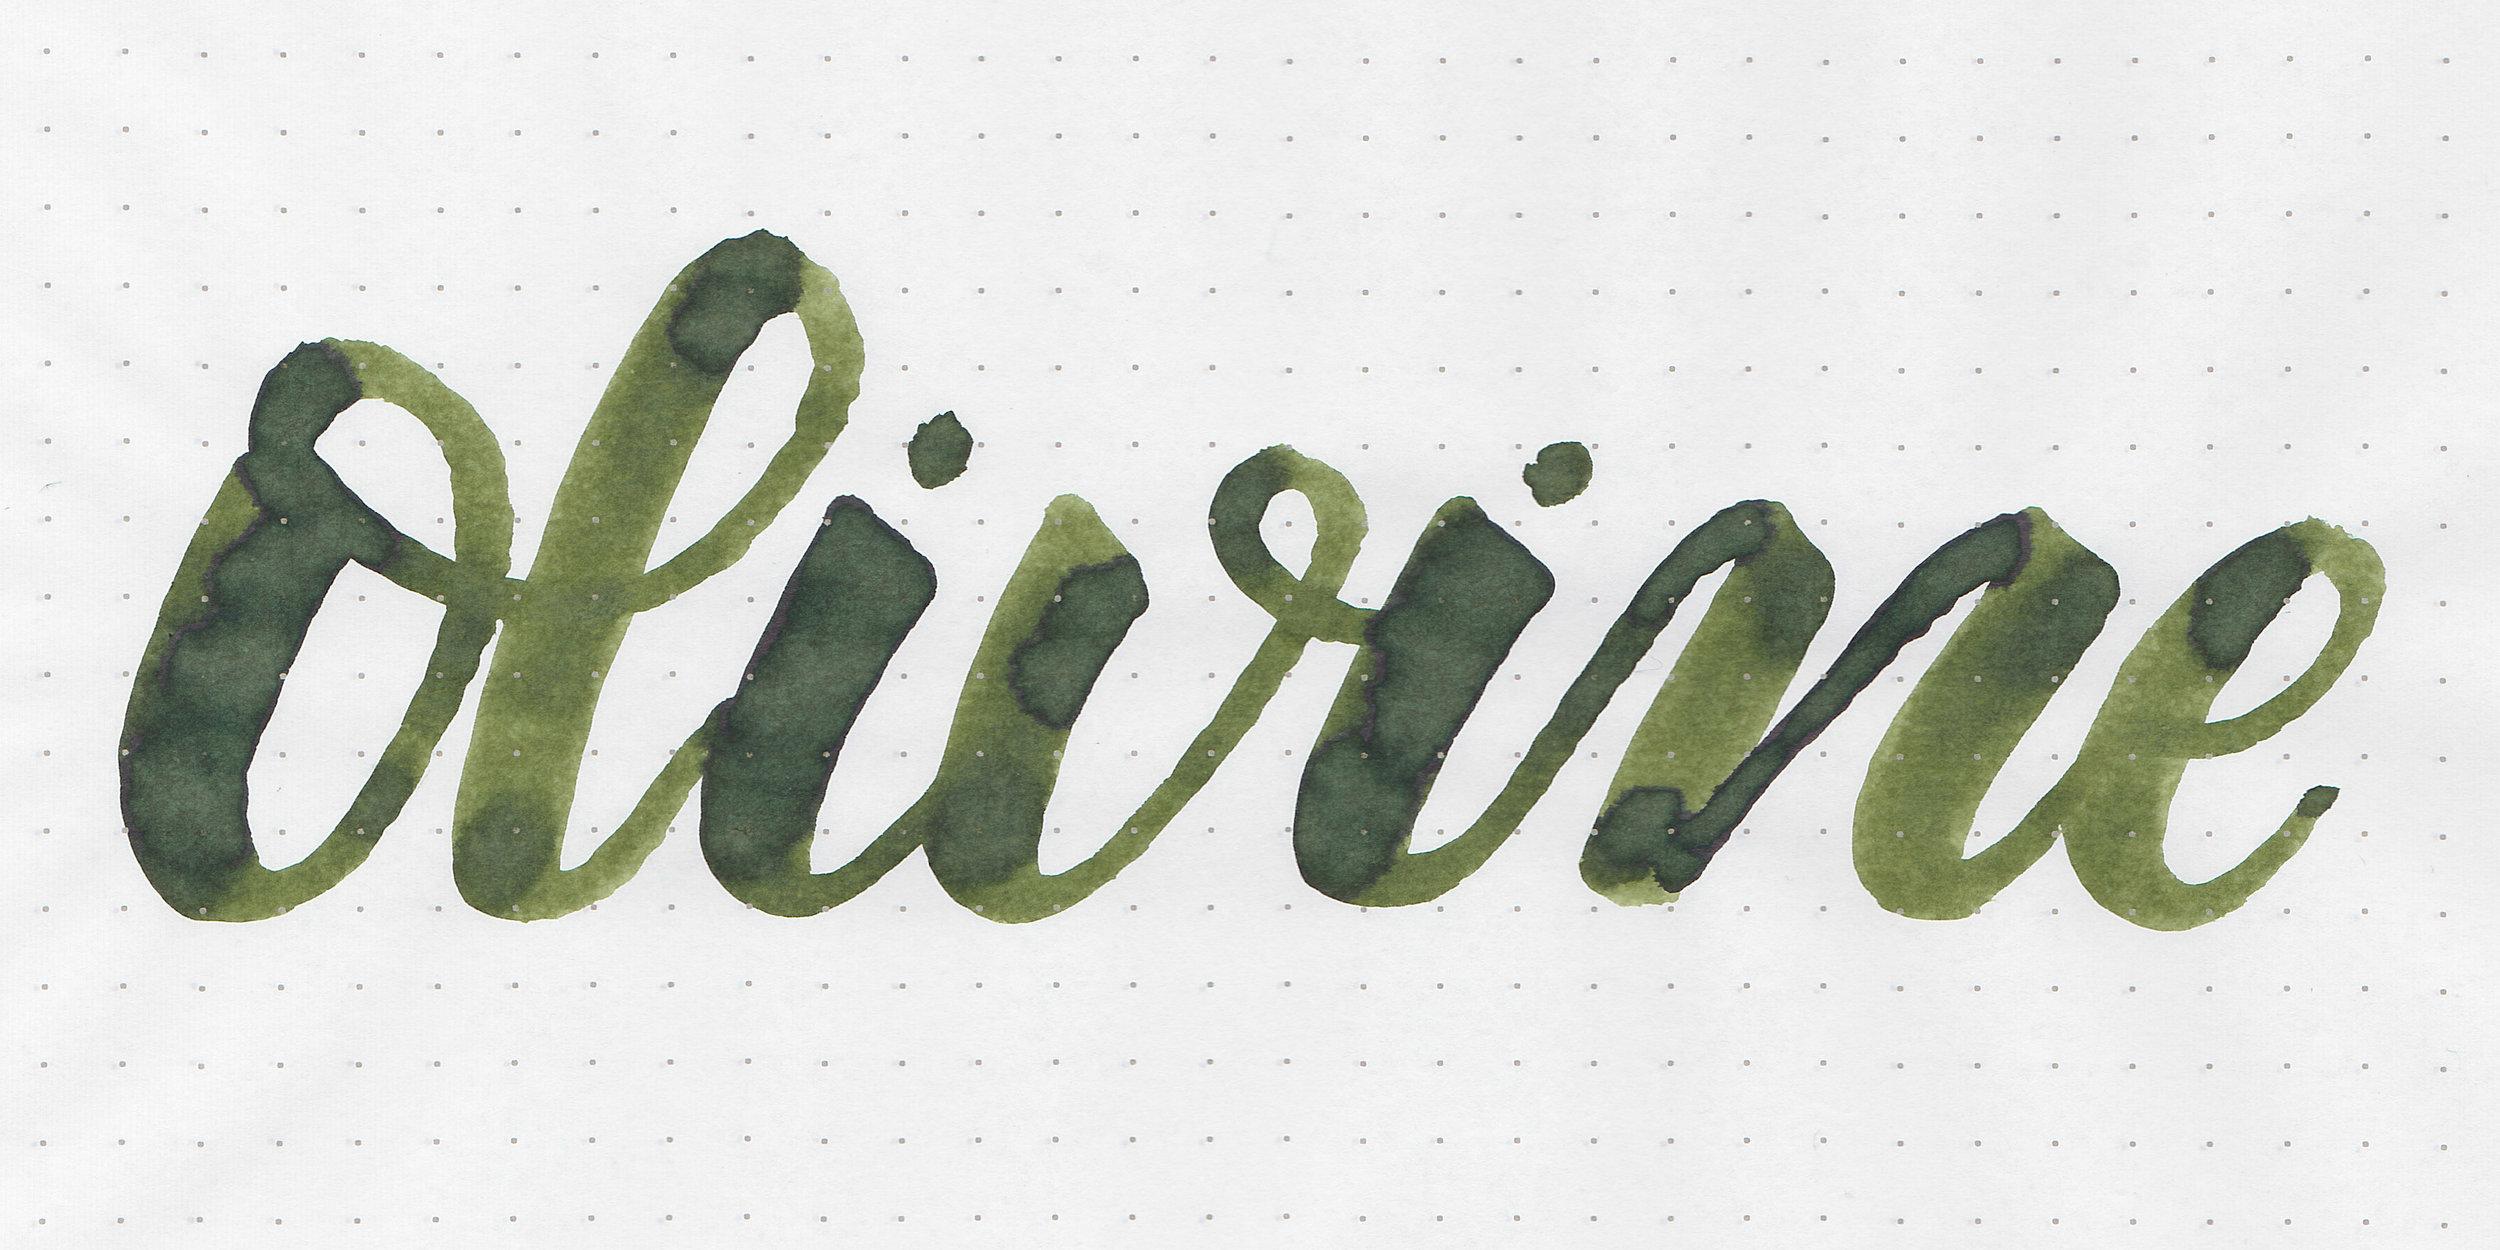 mv-olivine-2.jpg